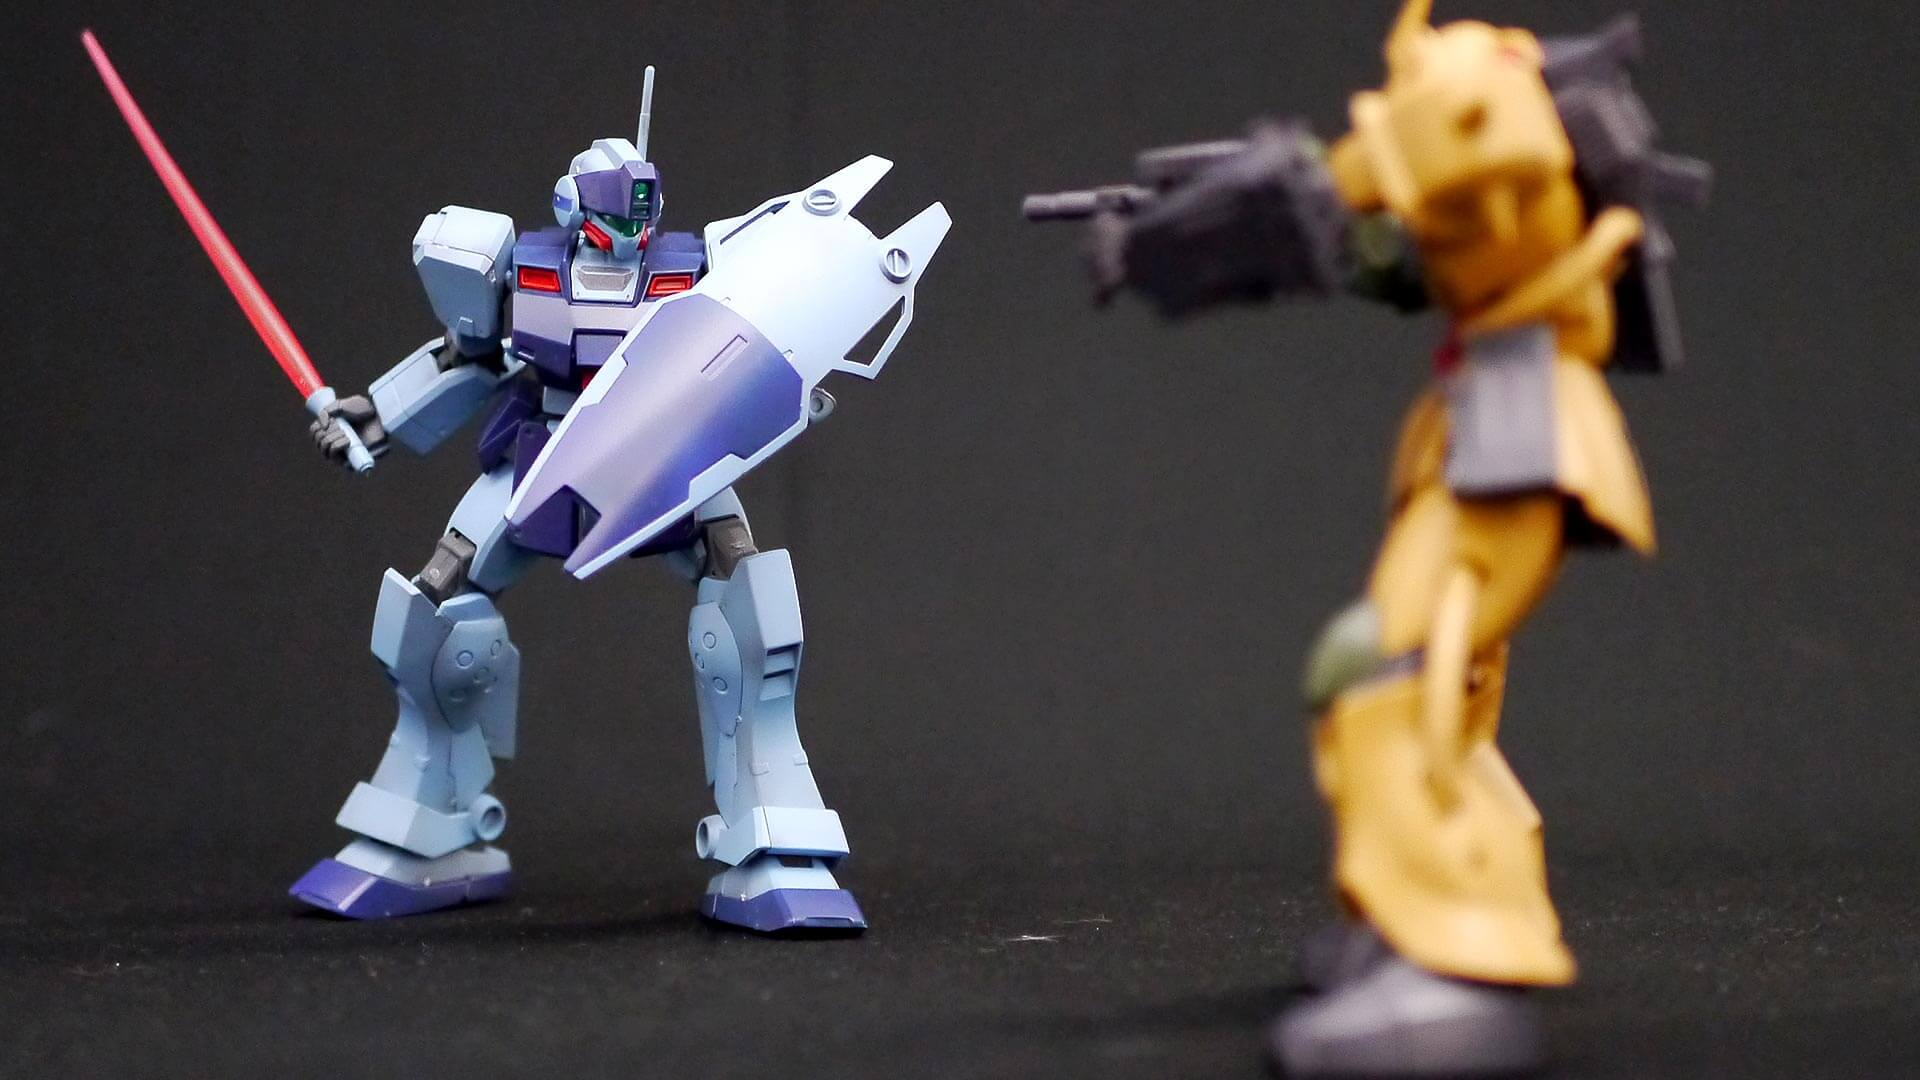 HGUC ジム・スナイパーII ROBOT魂 ザク・デザートタイプ 01